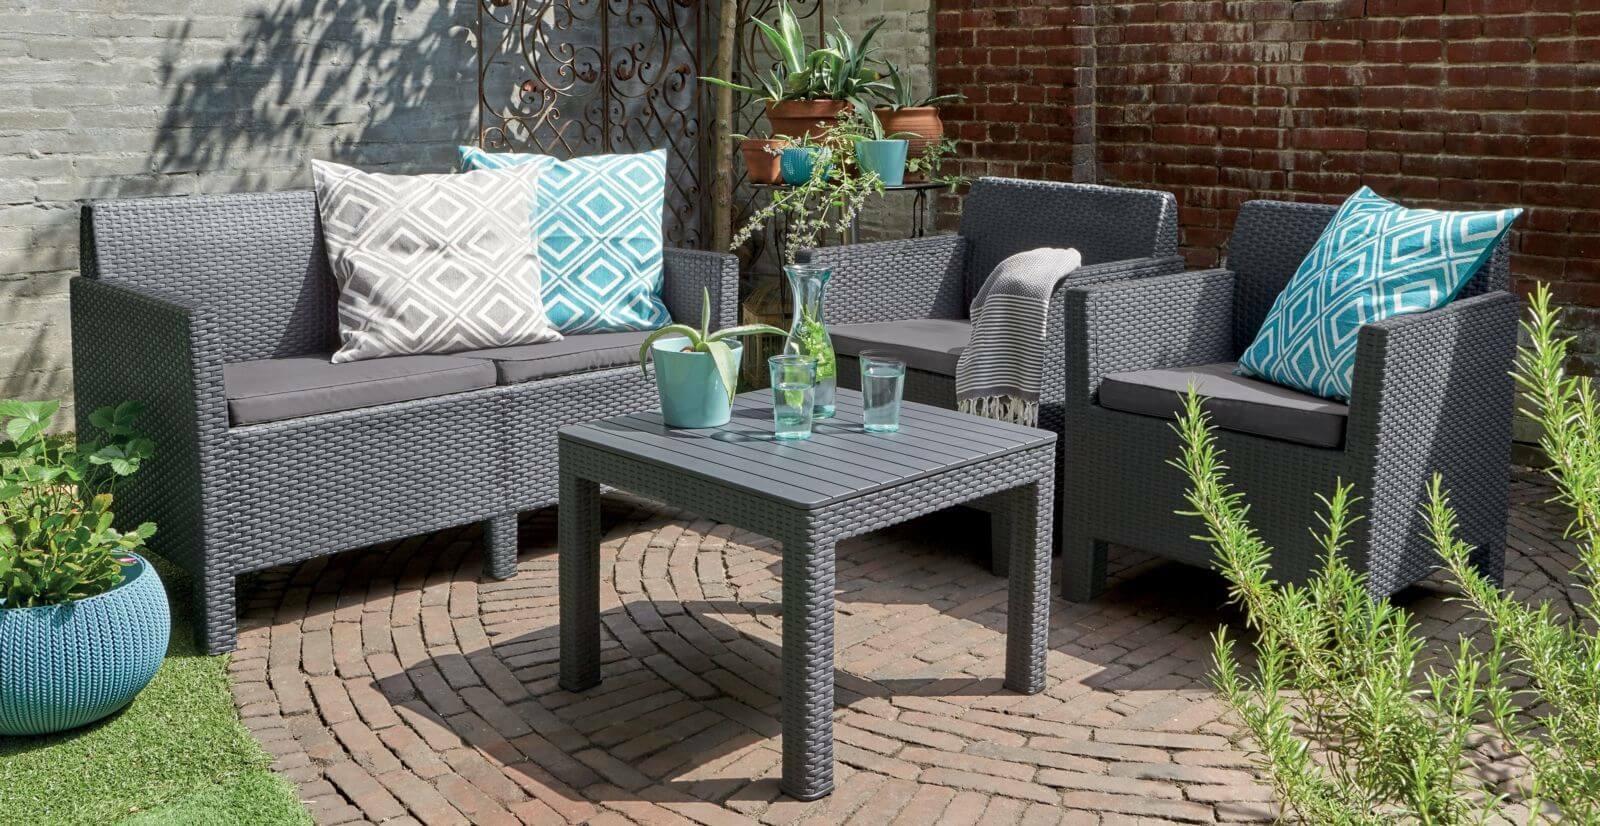 Garden Furniture - KETER 4 PIECE RATTAN GARDEN SET FURNITURE CHAIRS SOFA TABLE PATIO CONSERVATORY